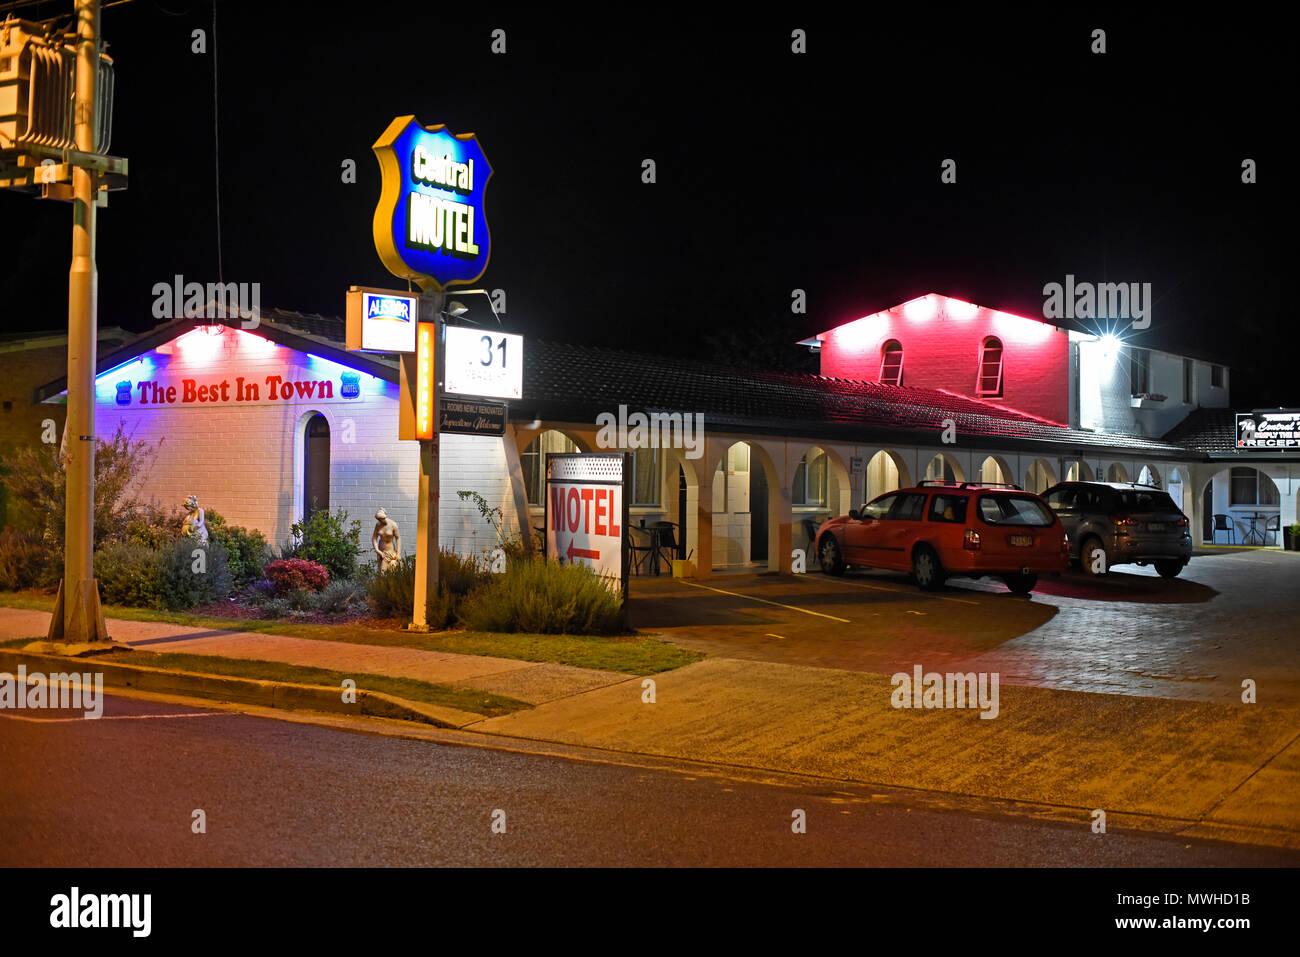 motel south australia stock photos motel south australia. Black Bedroom Furniture Sets. Home Design Ideas